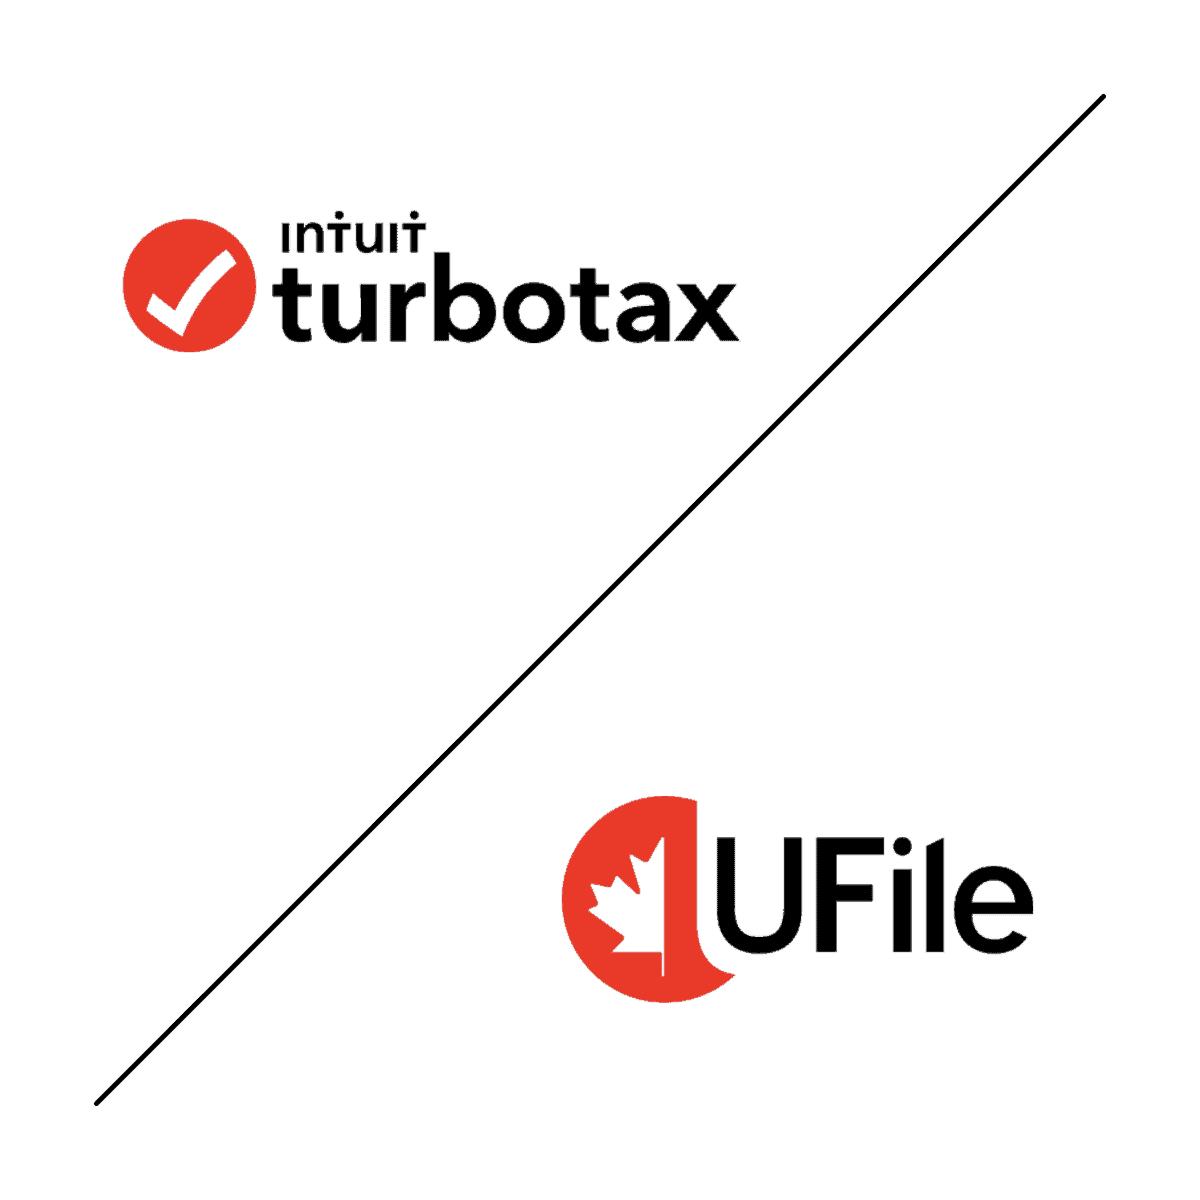 Compare TurboTax vs. UFile